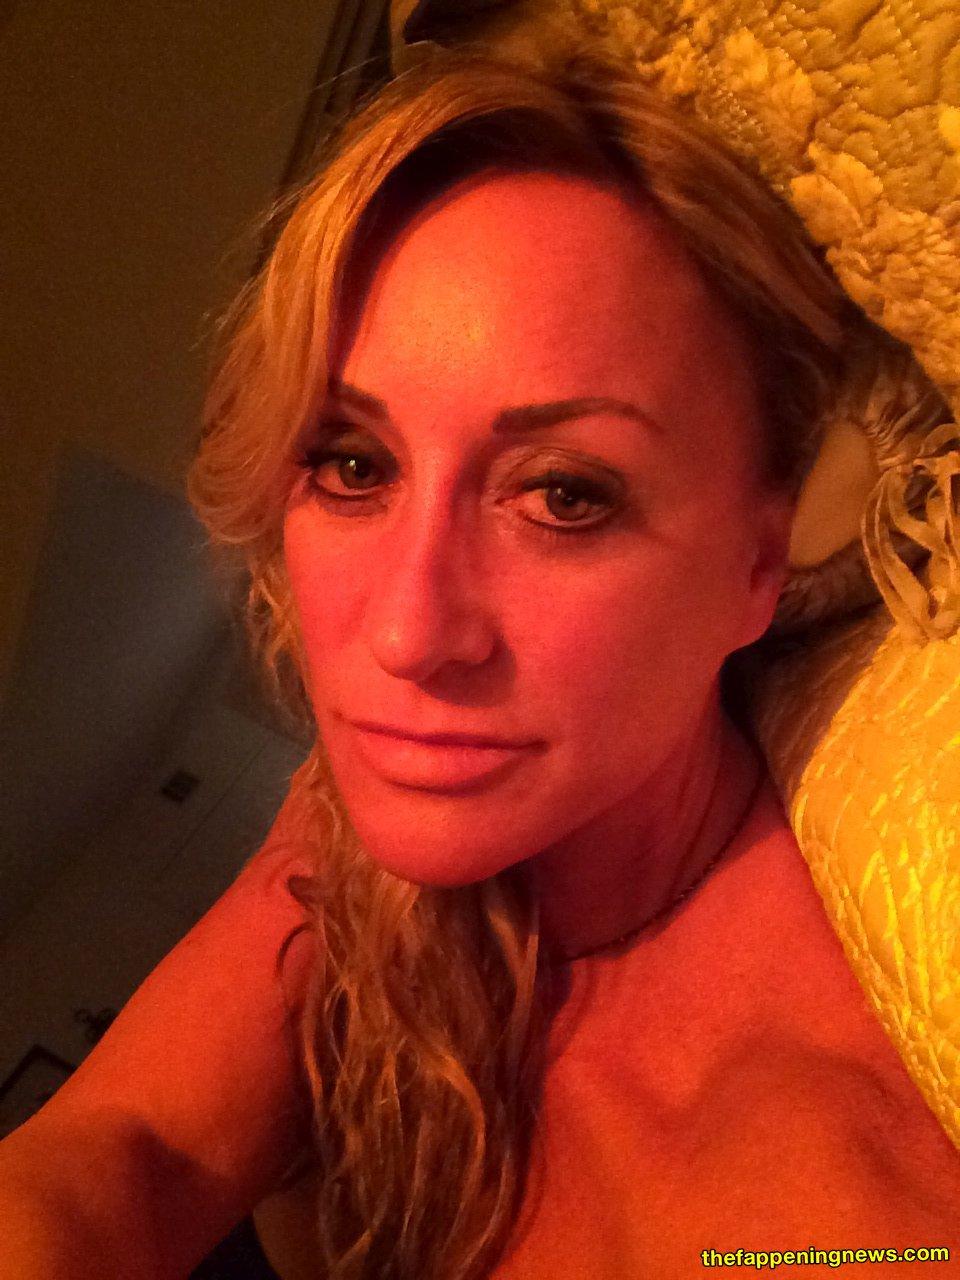 AJ Michalka naked | The Fappening. 2014-2020 celebrity